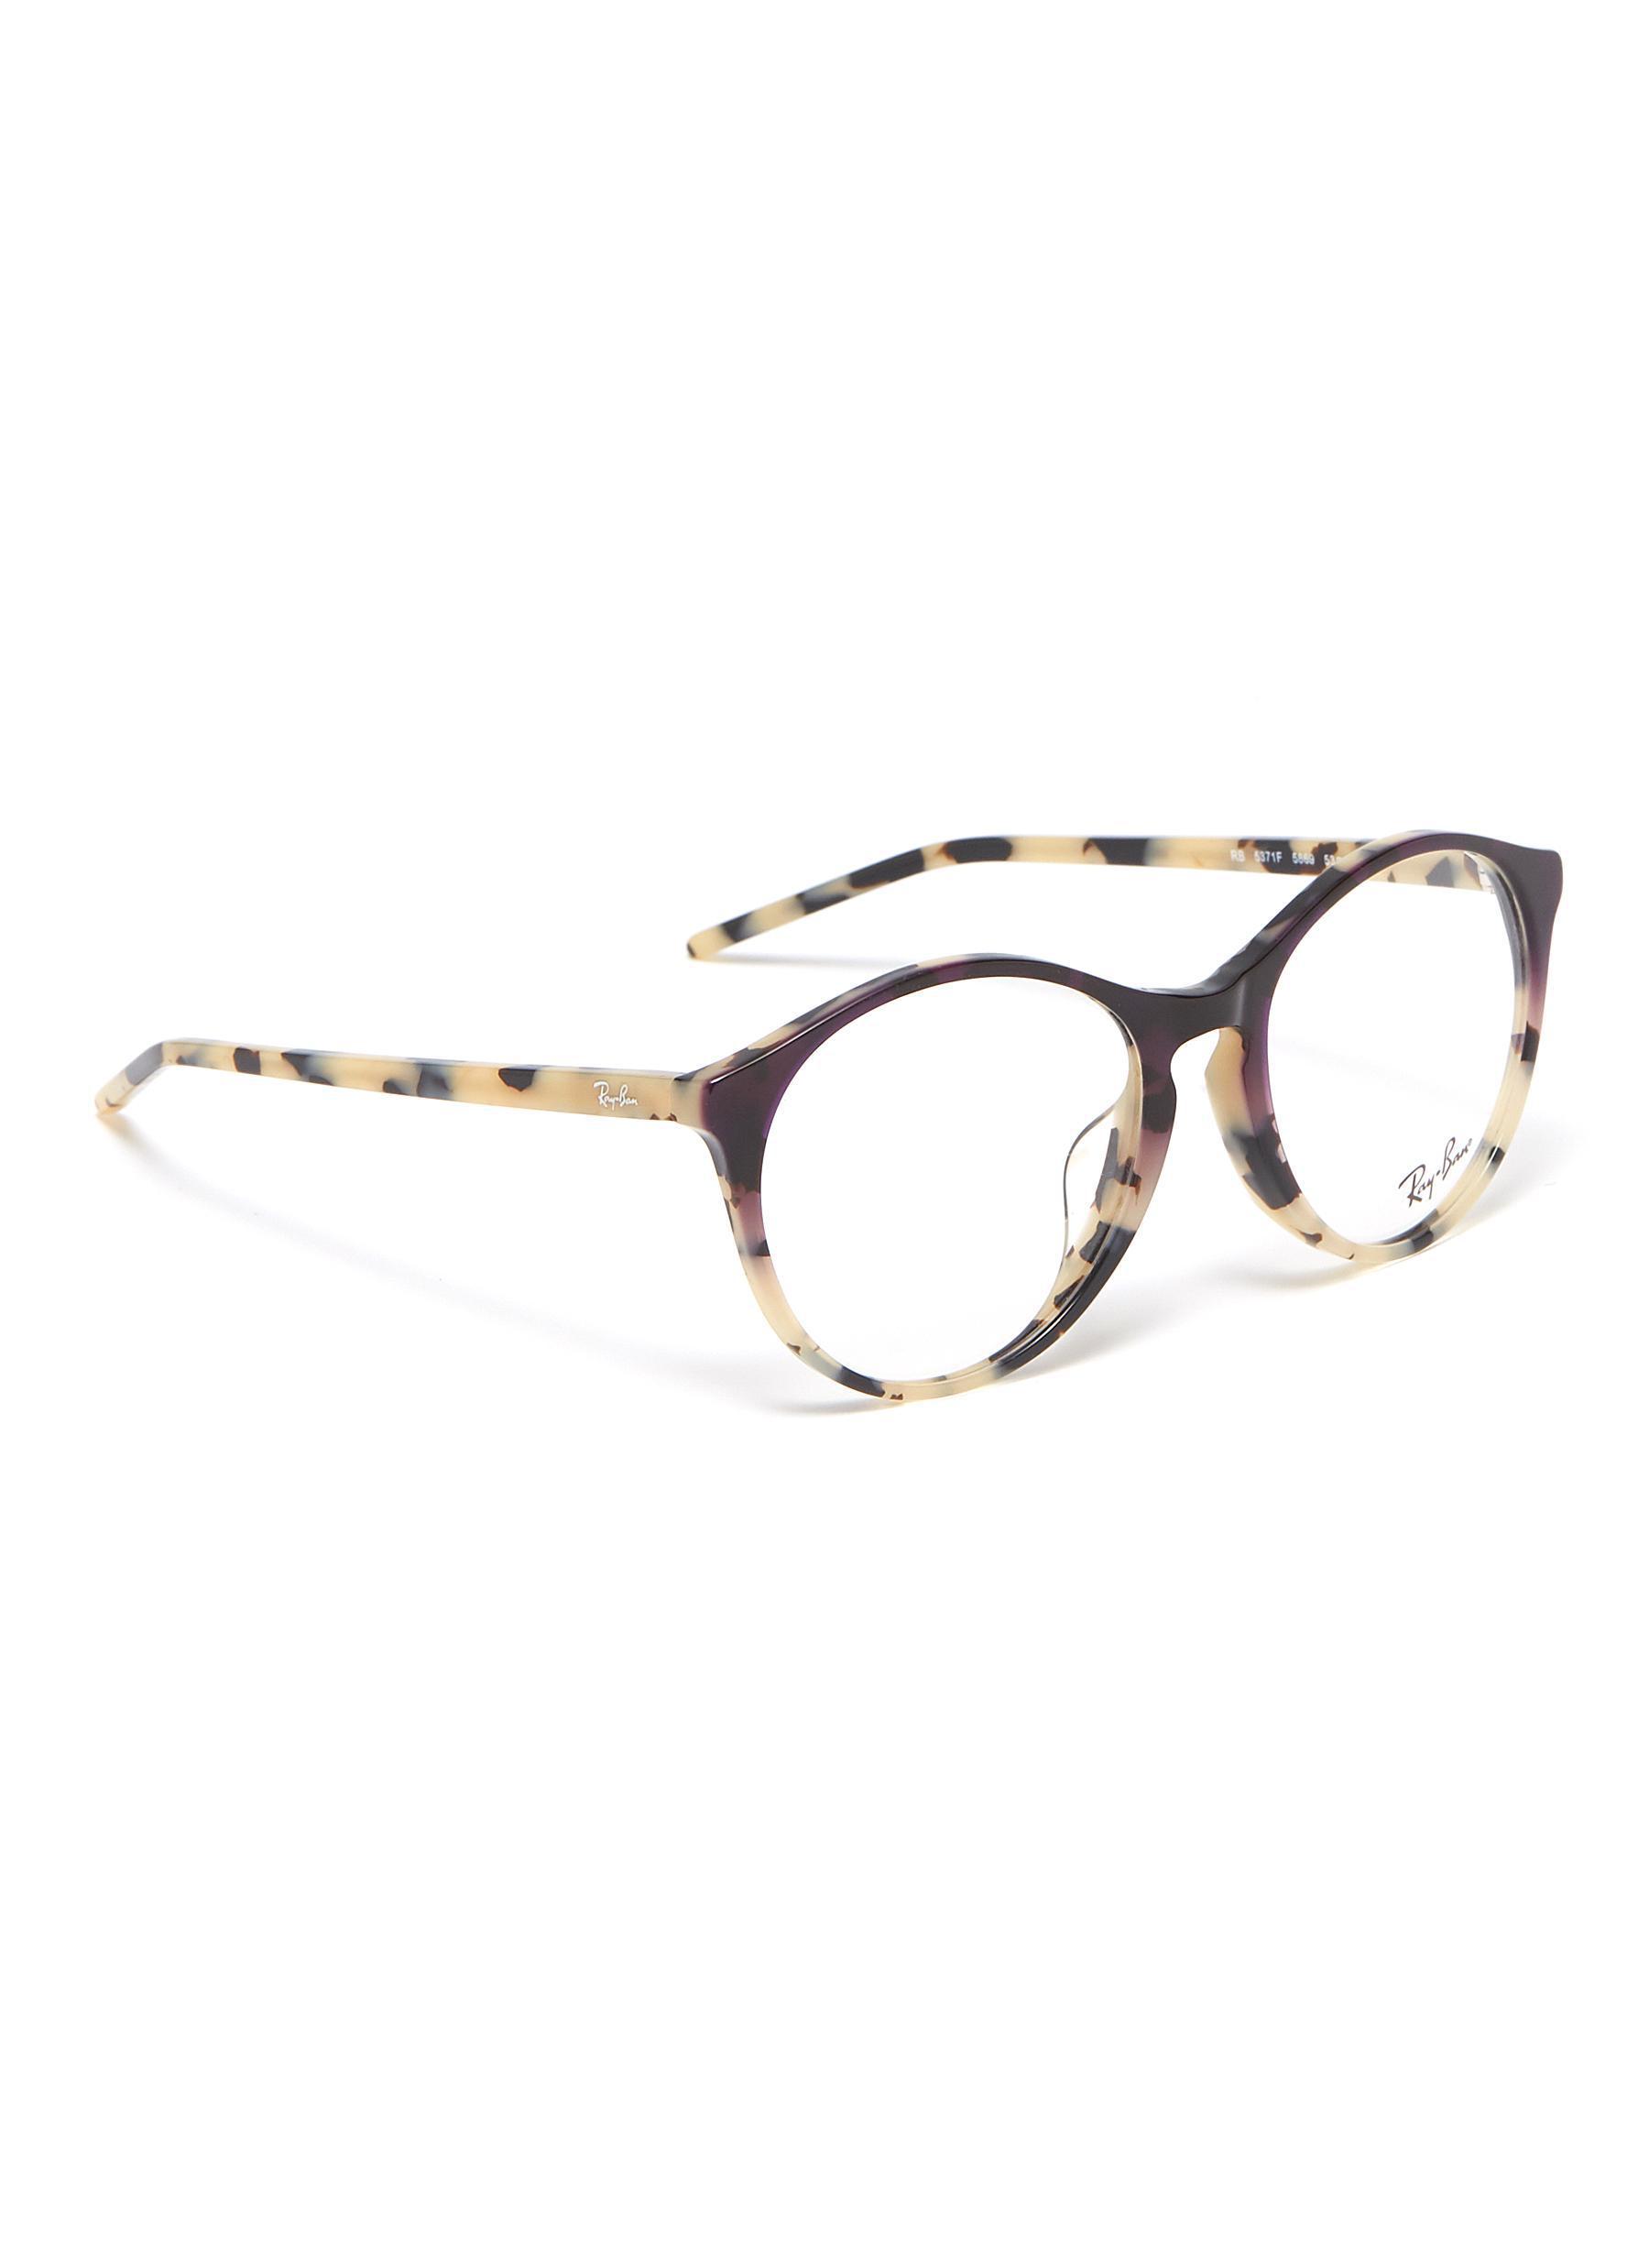 372204ec7f Ray-Ban  rx5371  Tortoiseshell Acetate Panto Optical Glasses - Lyst